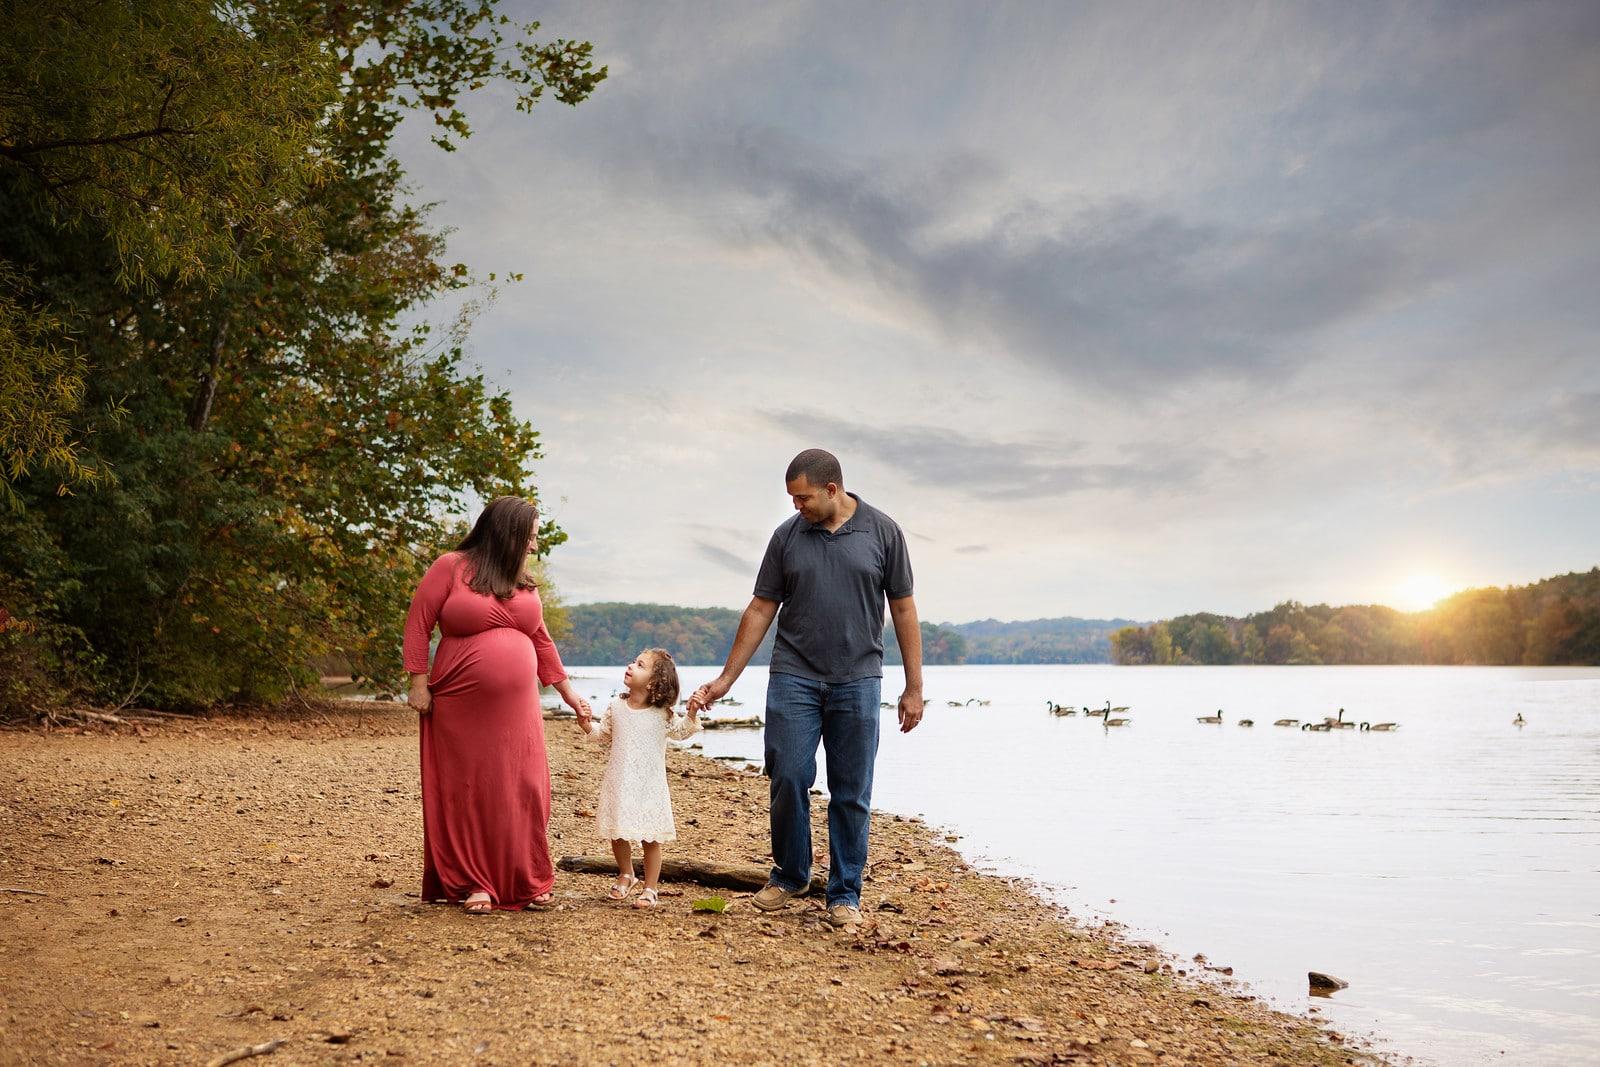 Joy of growing family